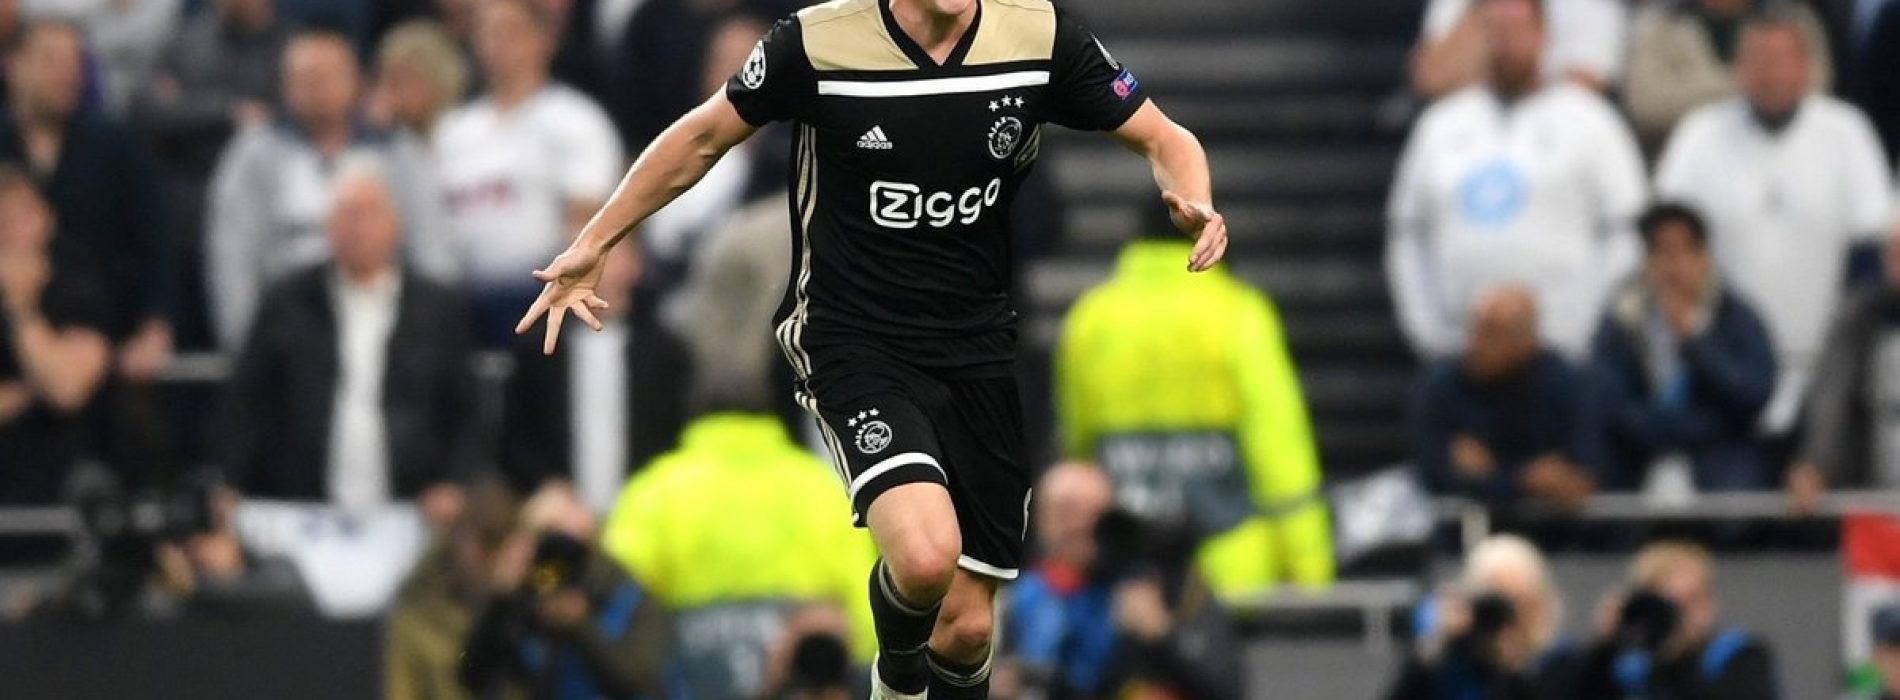 Napoli Van de Beek se Allan va al PSG. Cifre e dettagli – ESCLUSIVA EC